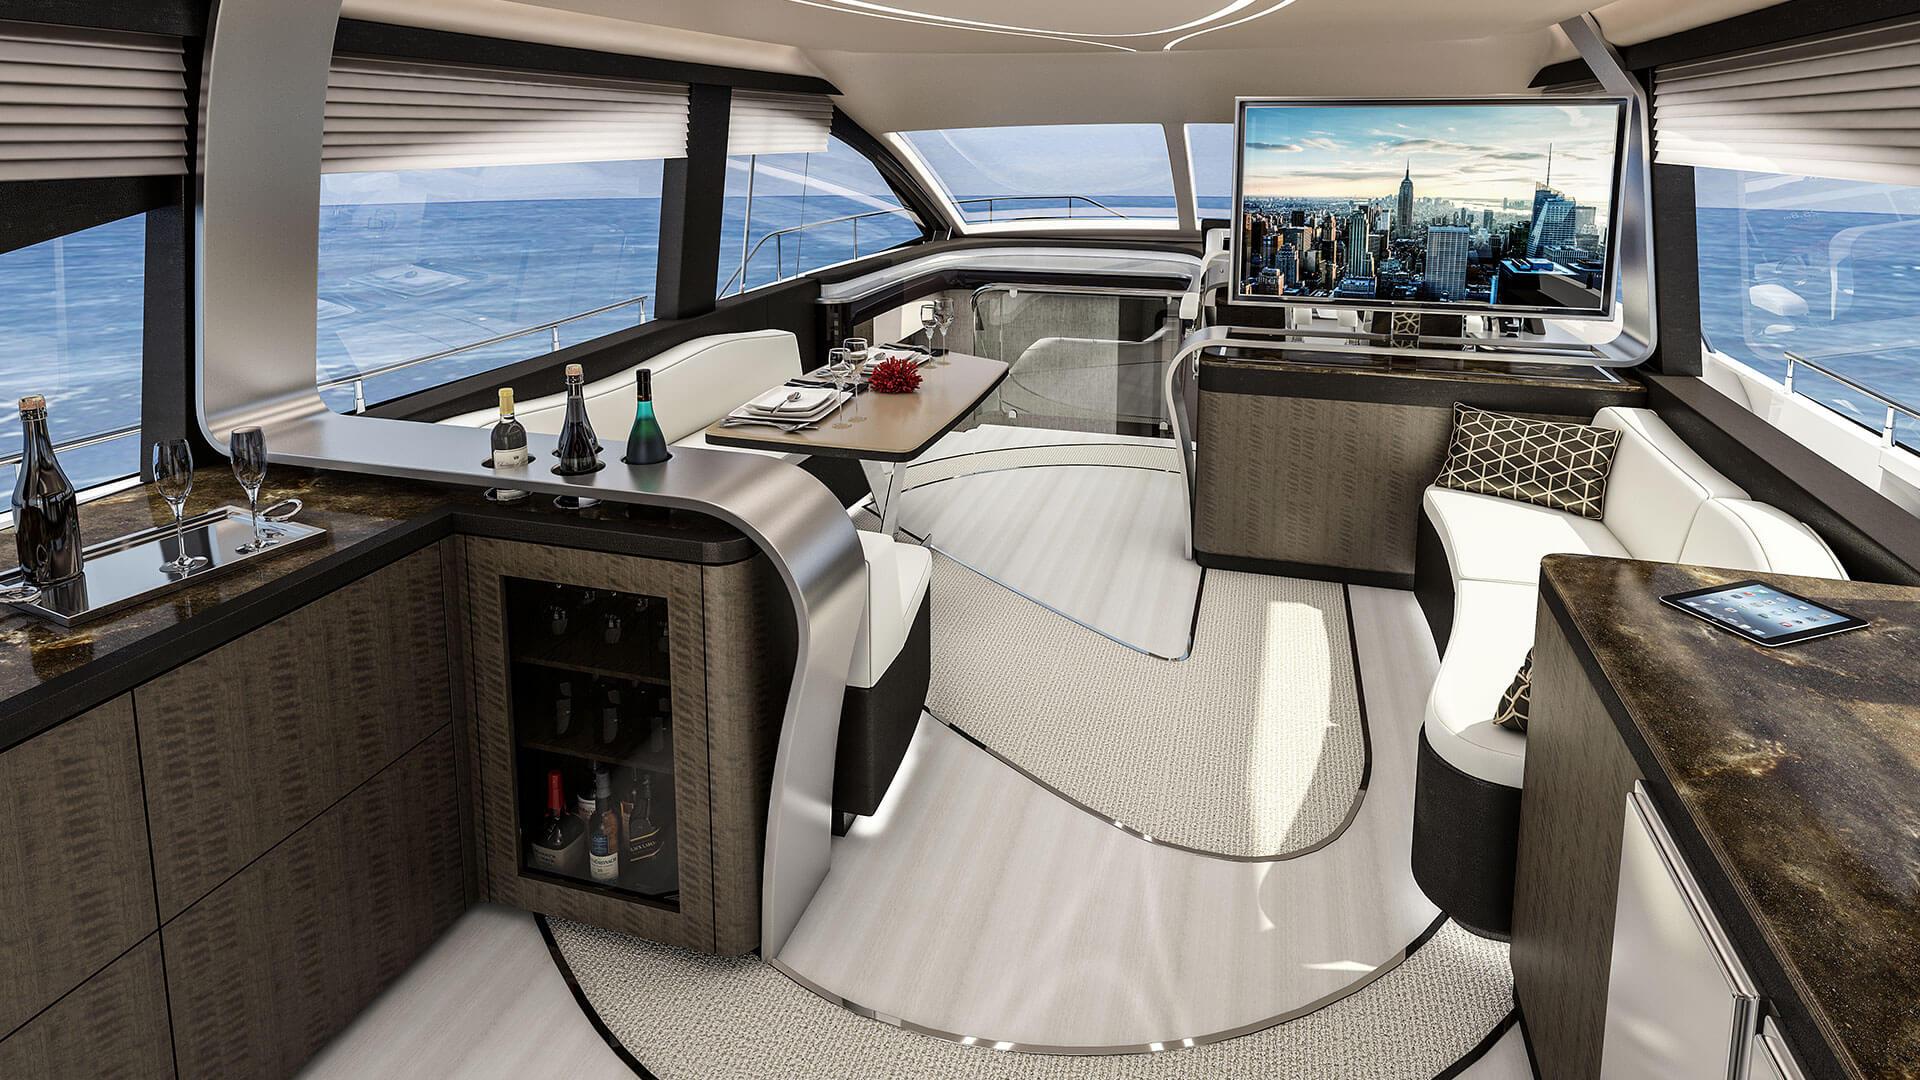 2019 lexus ly 650 luxury yacht gallery 02